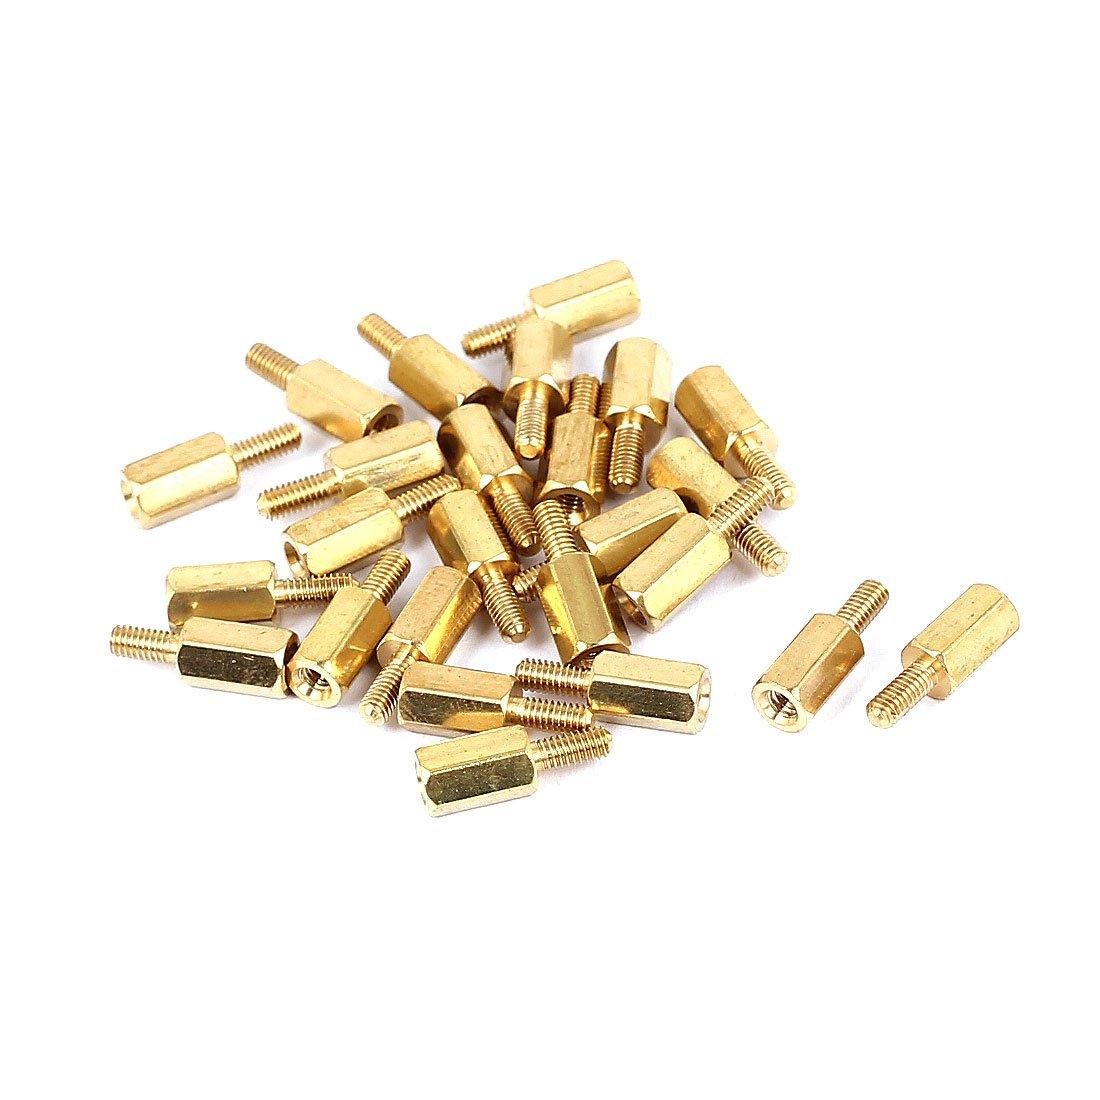 uxcell M3x8 6mm Female//Male Threaded Brass Hex Standoff Pillar Spacer 25pcs